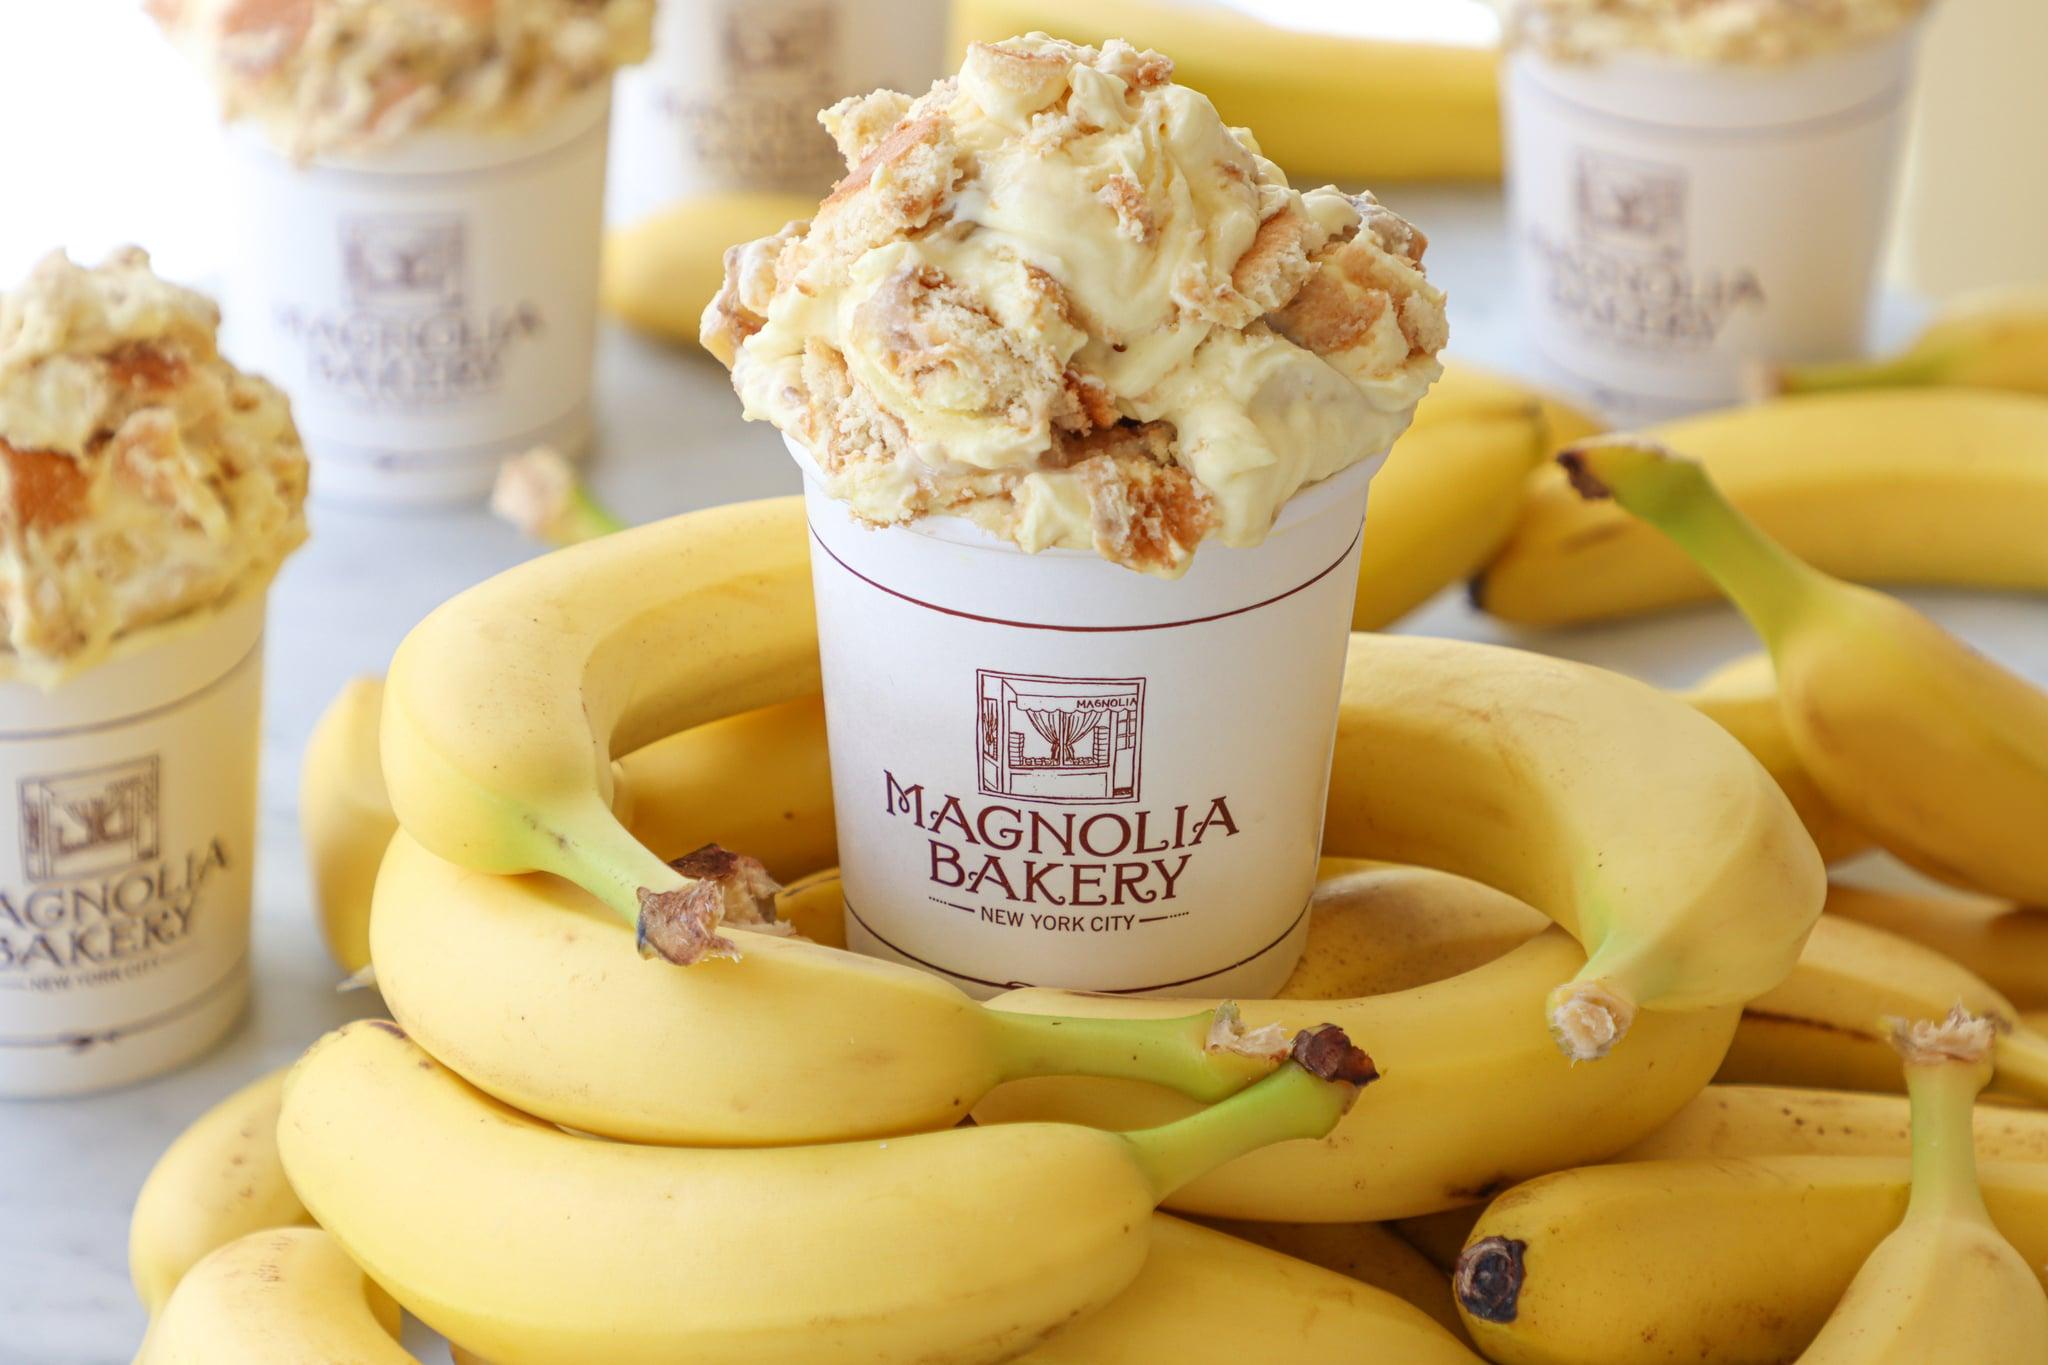 tmp_m6ubhp_d08ac528bf1b9a2a_Magnolia_Bakery_GF_Banana_Pudding_3.jpg